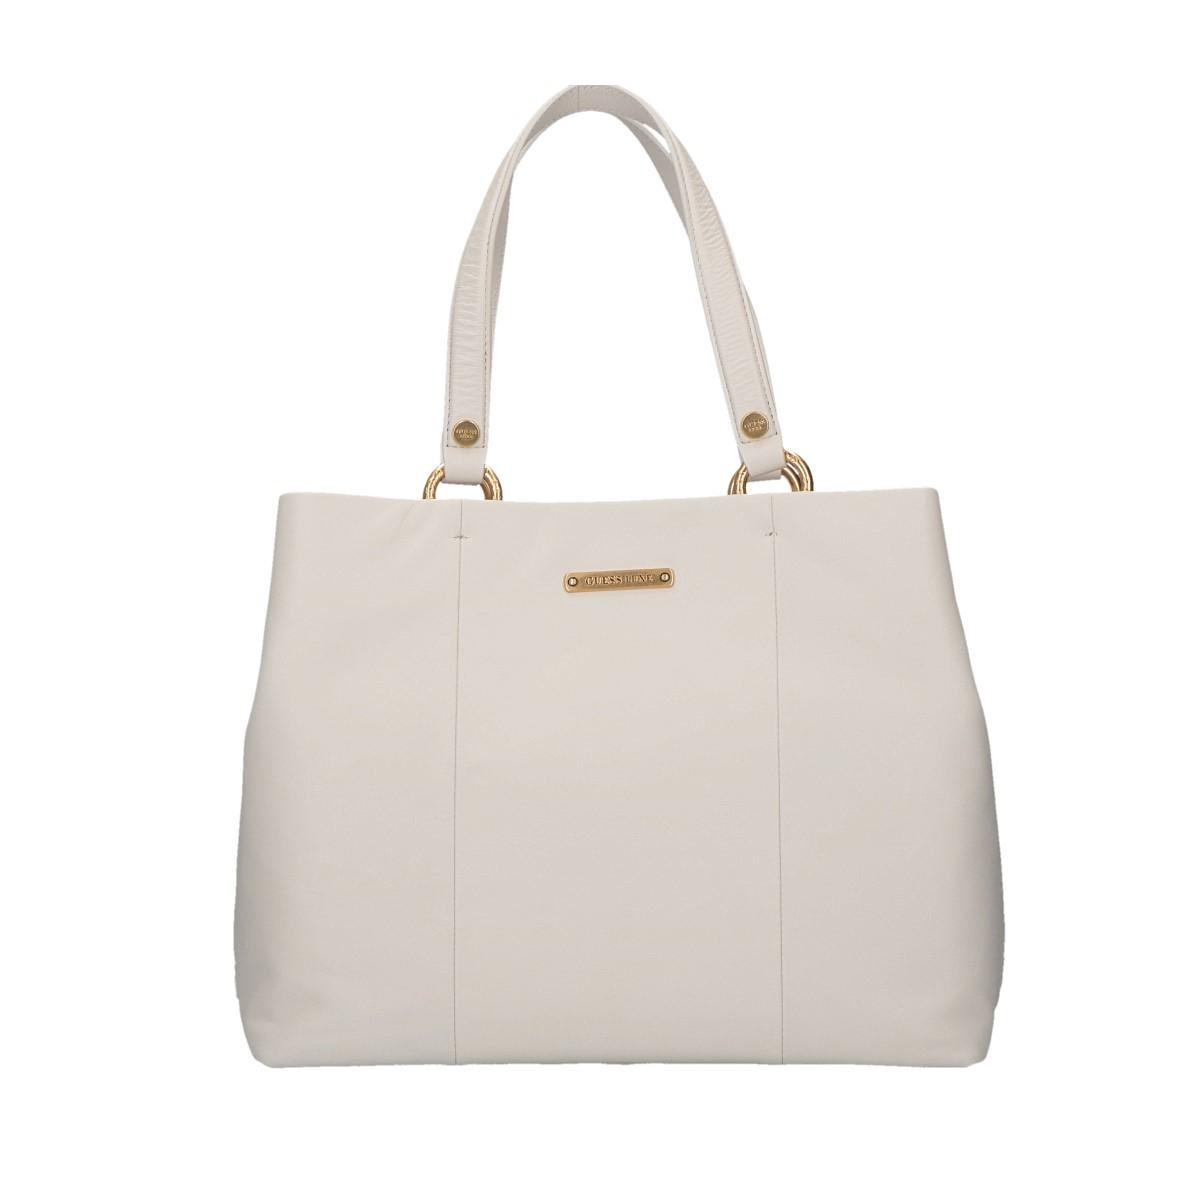 Guess Denim Handbags   Handbag Reviews 2018